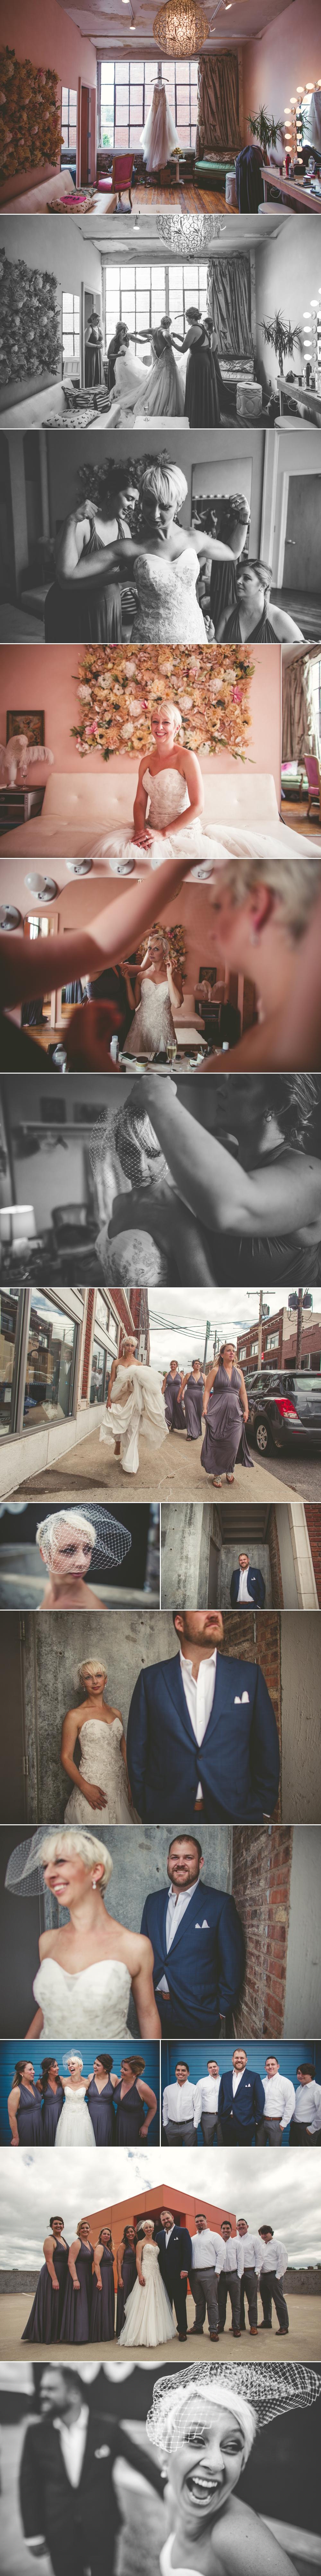 jason_domingues_photography_best_kansas_city_photographer_kc_weddings_toms_town_bauer_0001.jpg